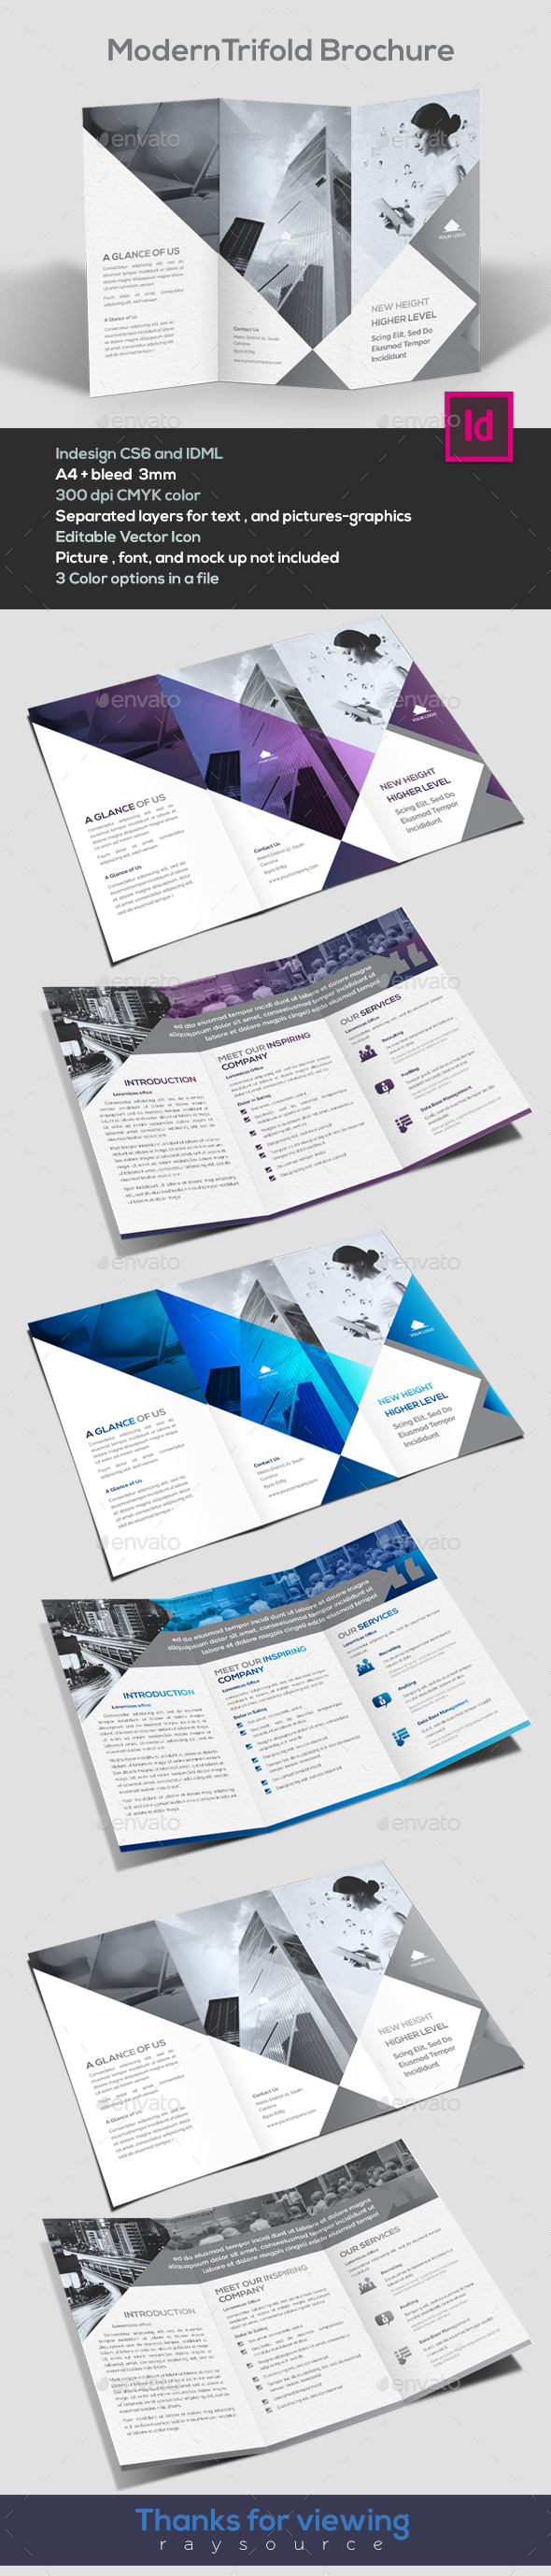 Modern Trifold brochure - Corporate Brochures